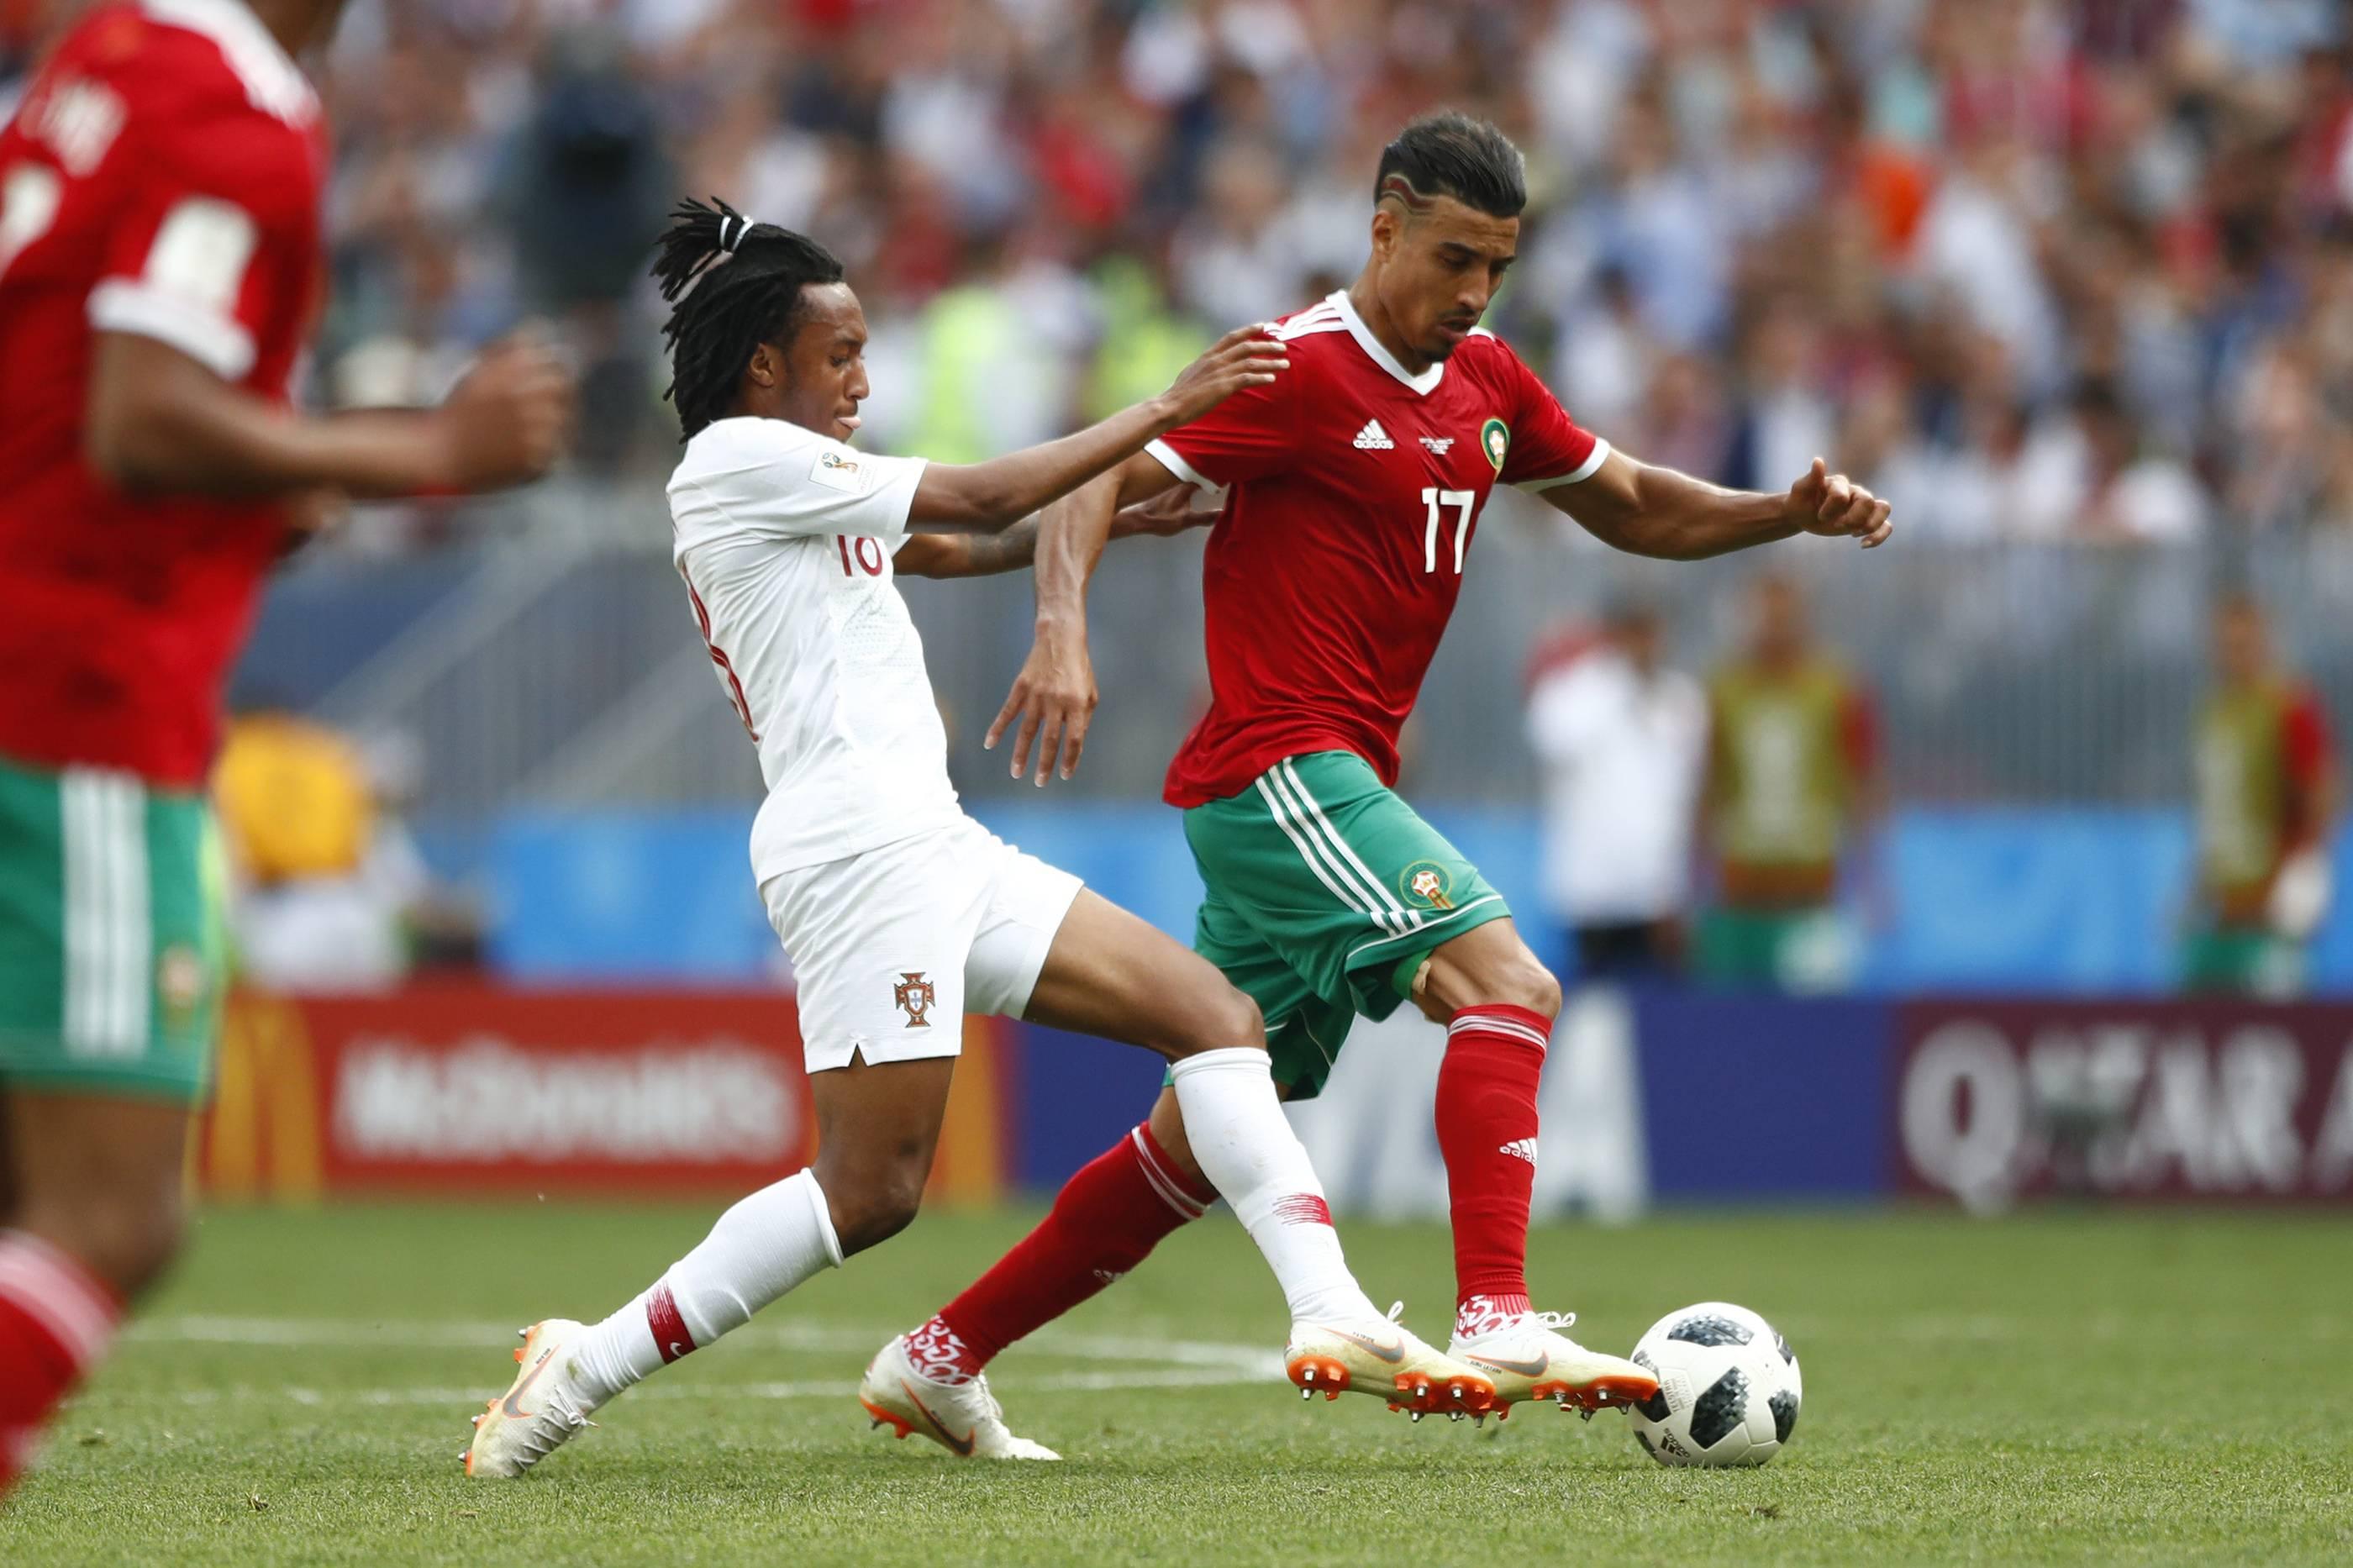 Marokko Gegen Portugal